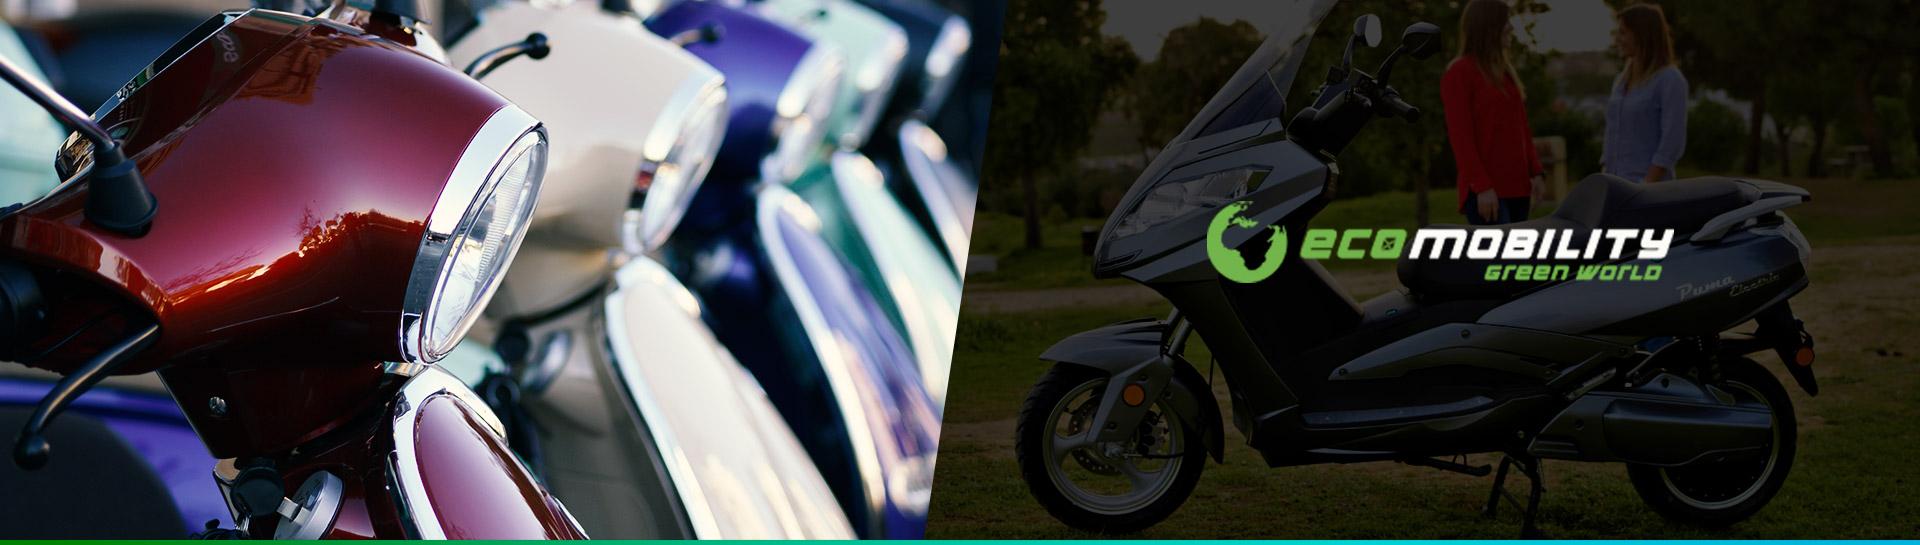 bg-header-ecomomility-green-scoomart